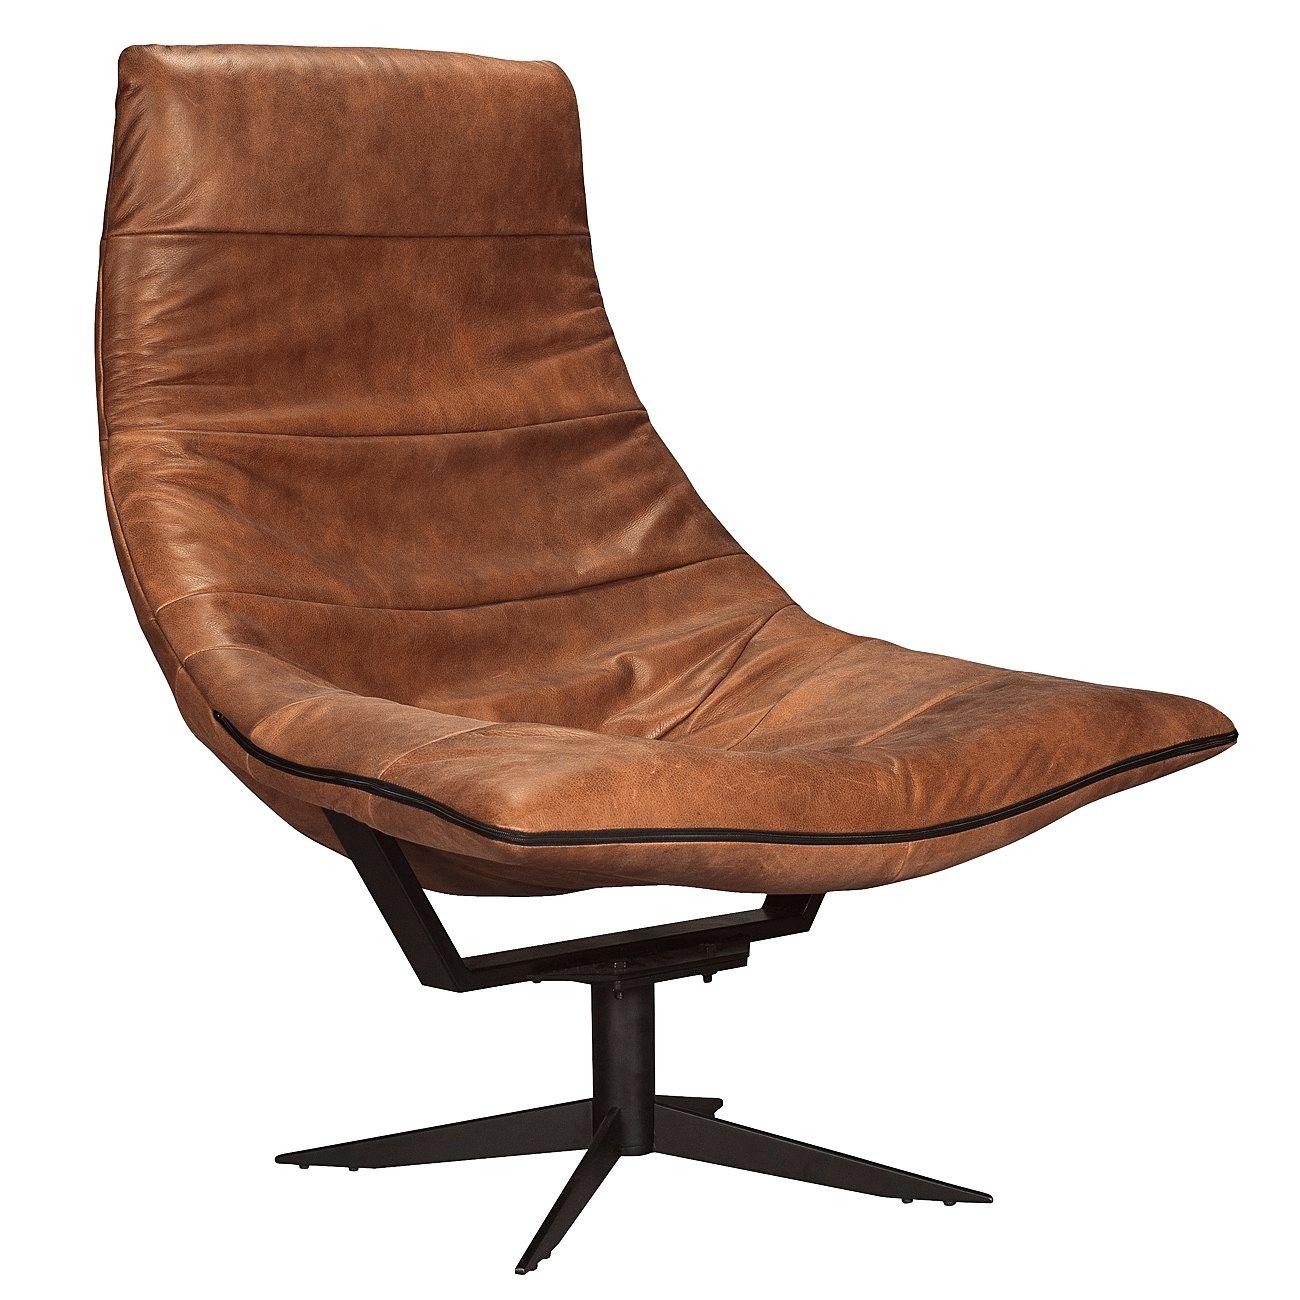 Turner fauteuil Bodilson Micro Leather 94 Cinnamon met voetenbank